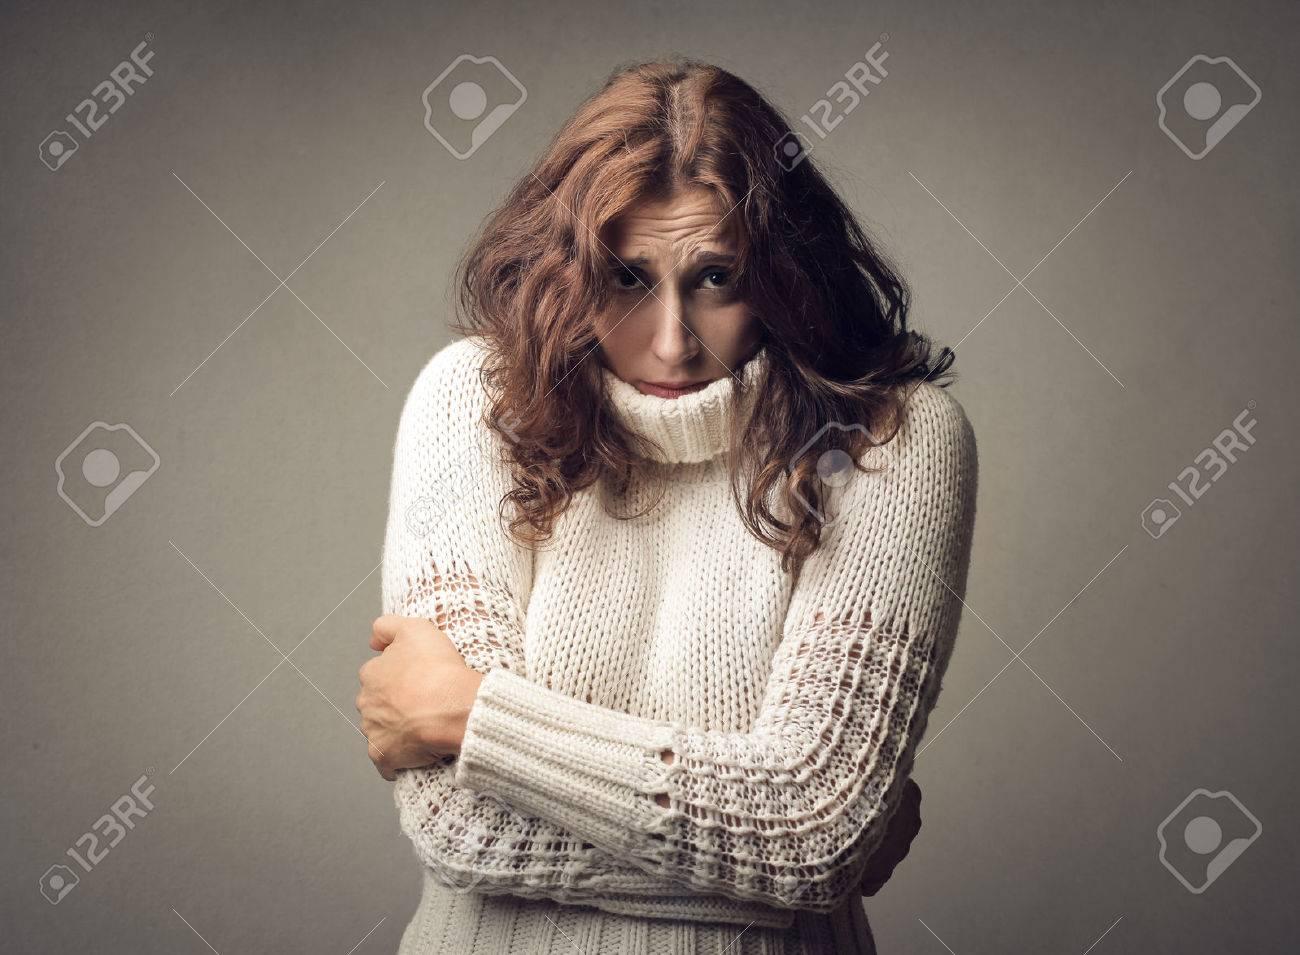 Woman feeling cold Standard-Bild - 59114942